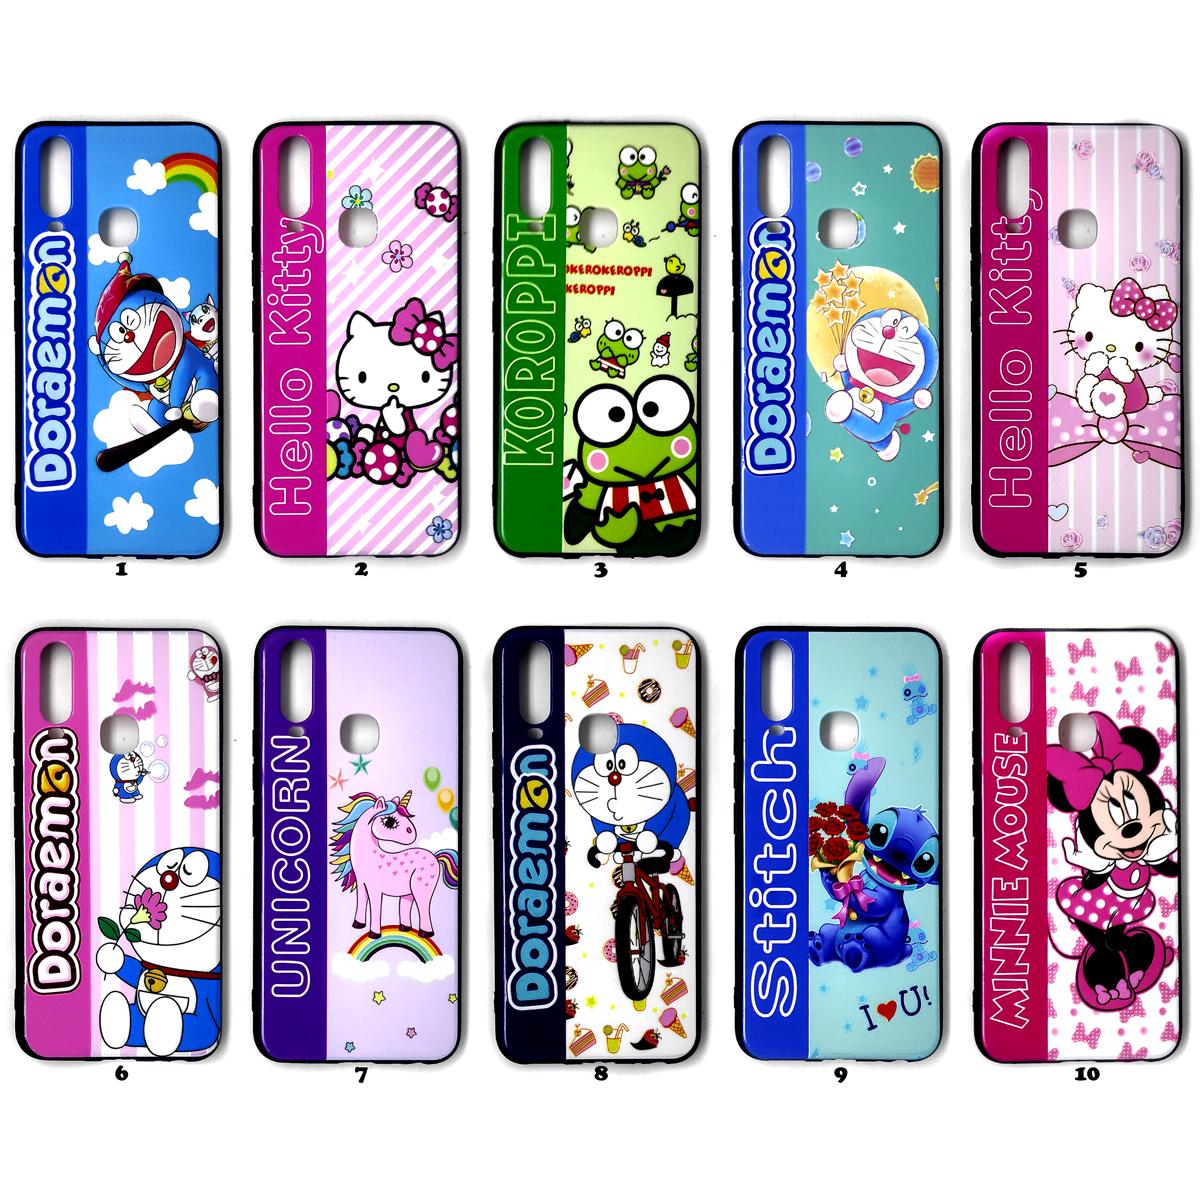 Vivo Y12 Y15 Y17 Case Karakter Boneka Gambar Doraemon Hello Kitty Minnie Mouse Keroppi Unicorn Stitch Lazada Indonesia